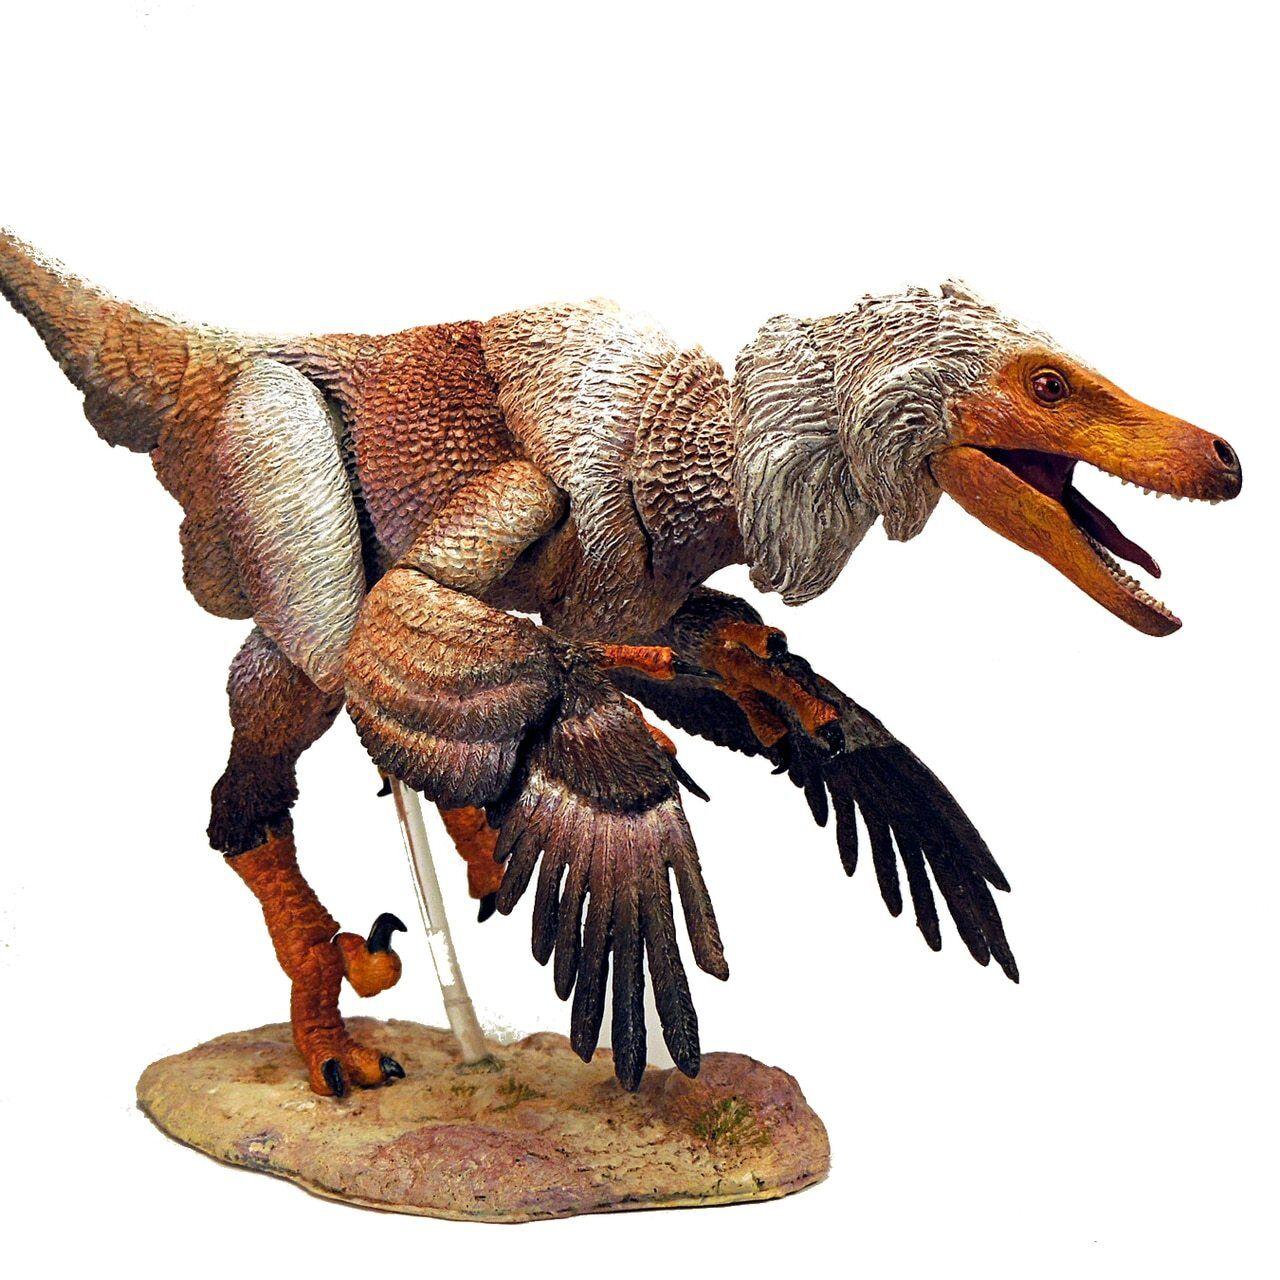 Beasts of the Mesozoic Tsagan Mangas Deluxe 1 6 skala Raptor Figurine